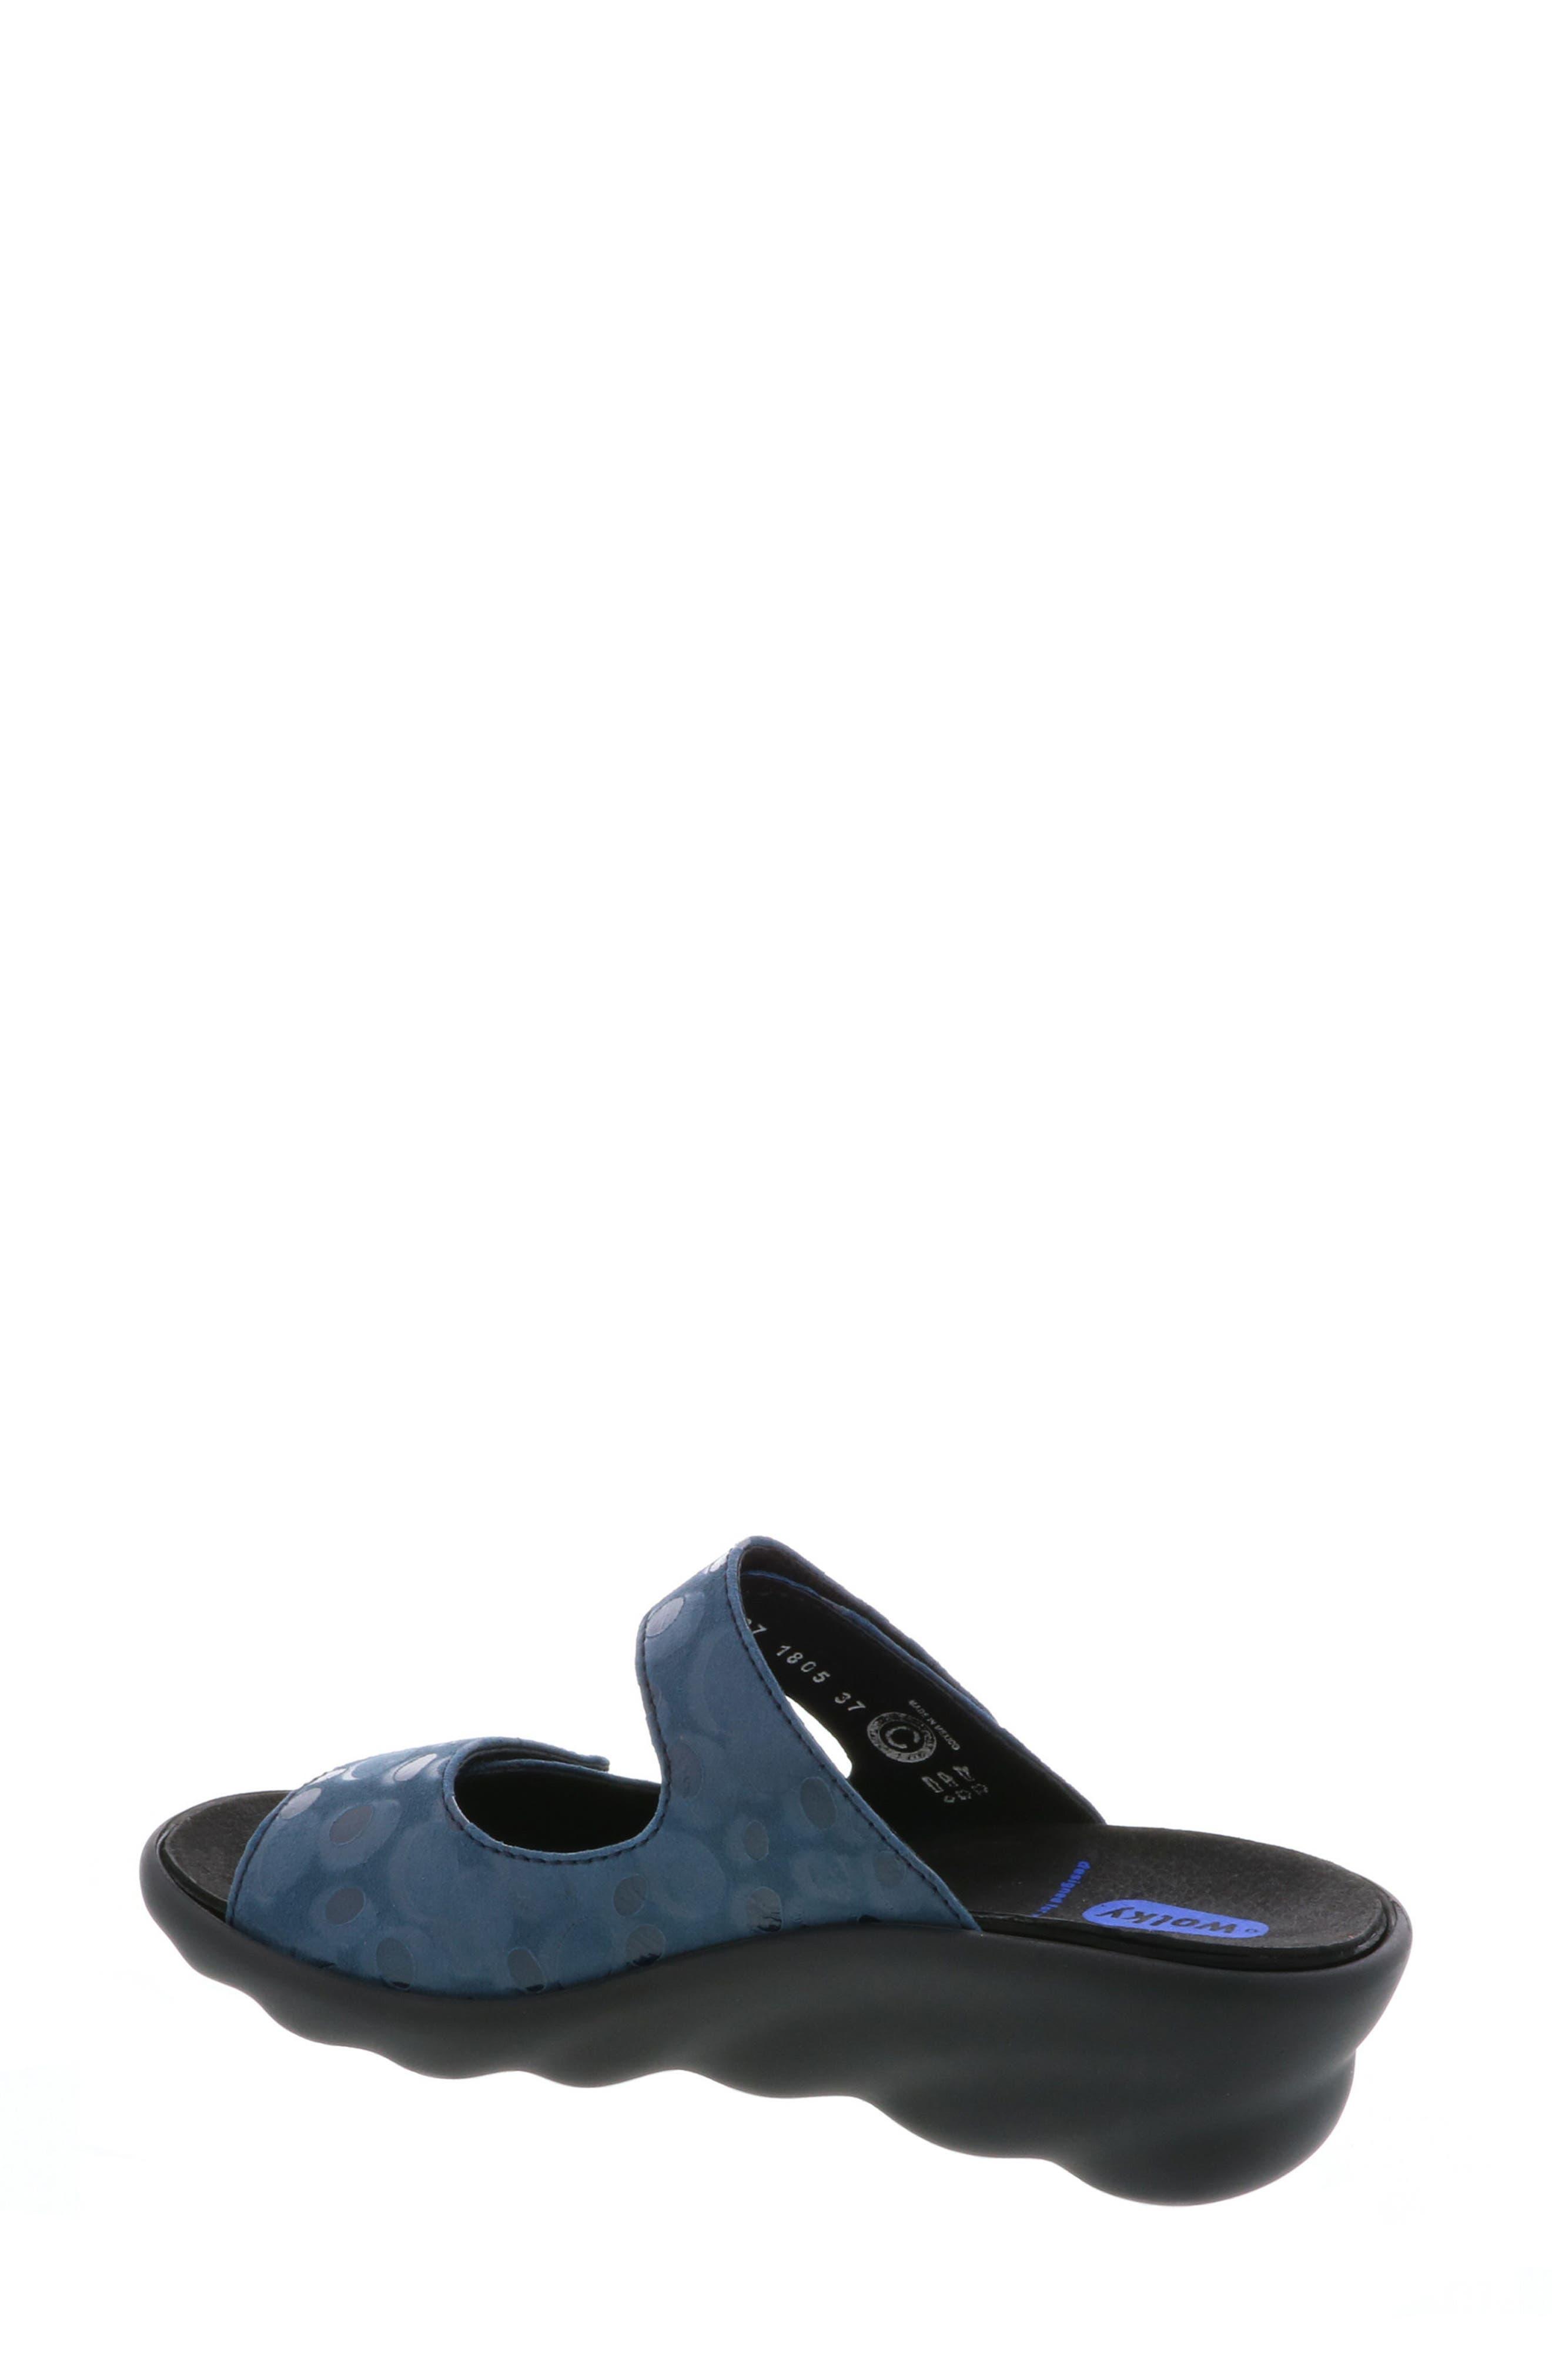 Bolena Slide Sandal,                             Alternate thumbnail 2, color,                             Blue Circle Print